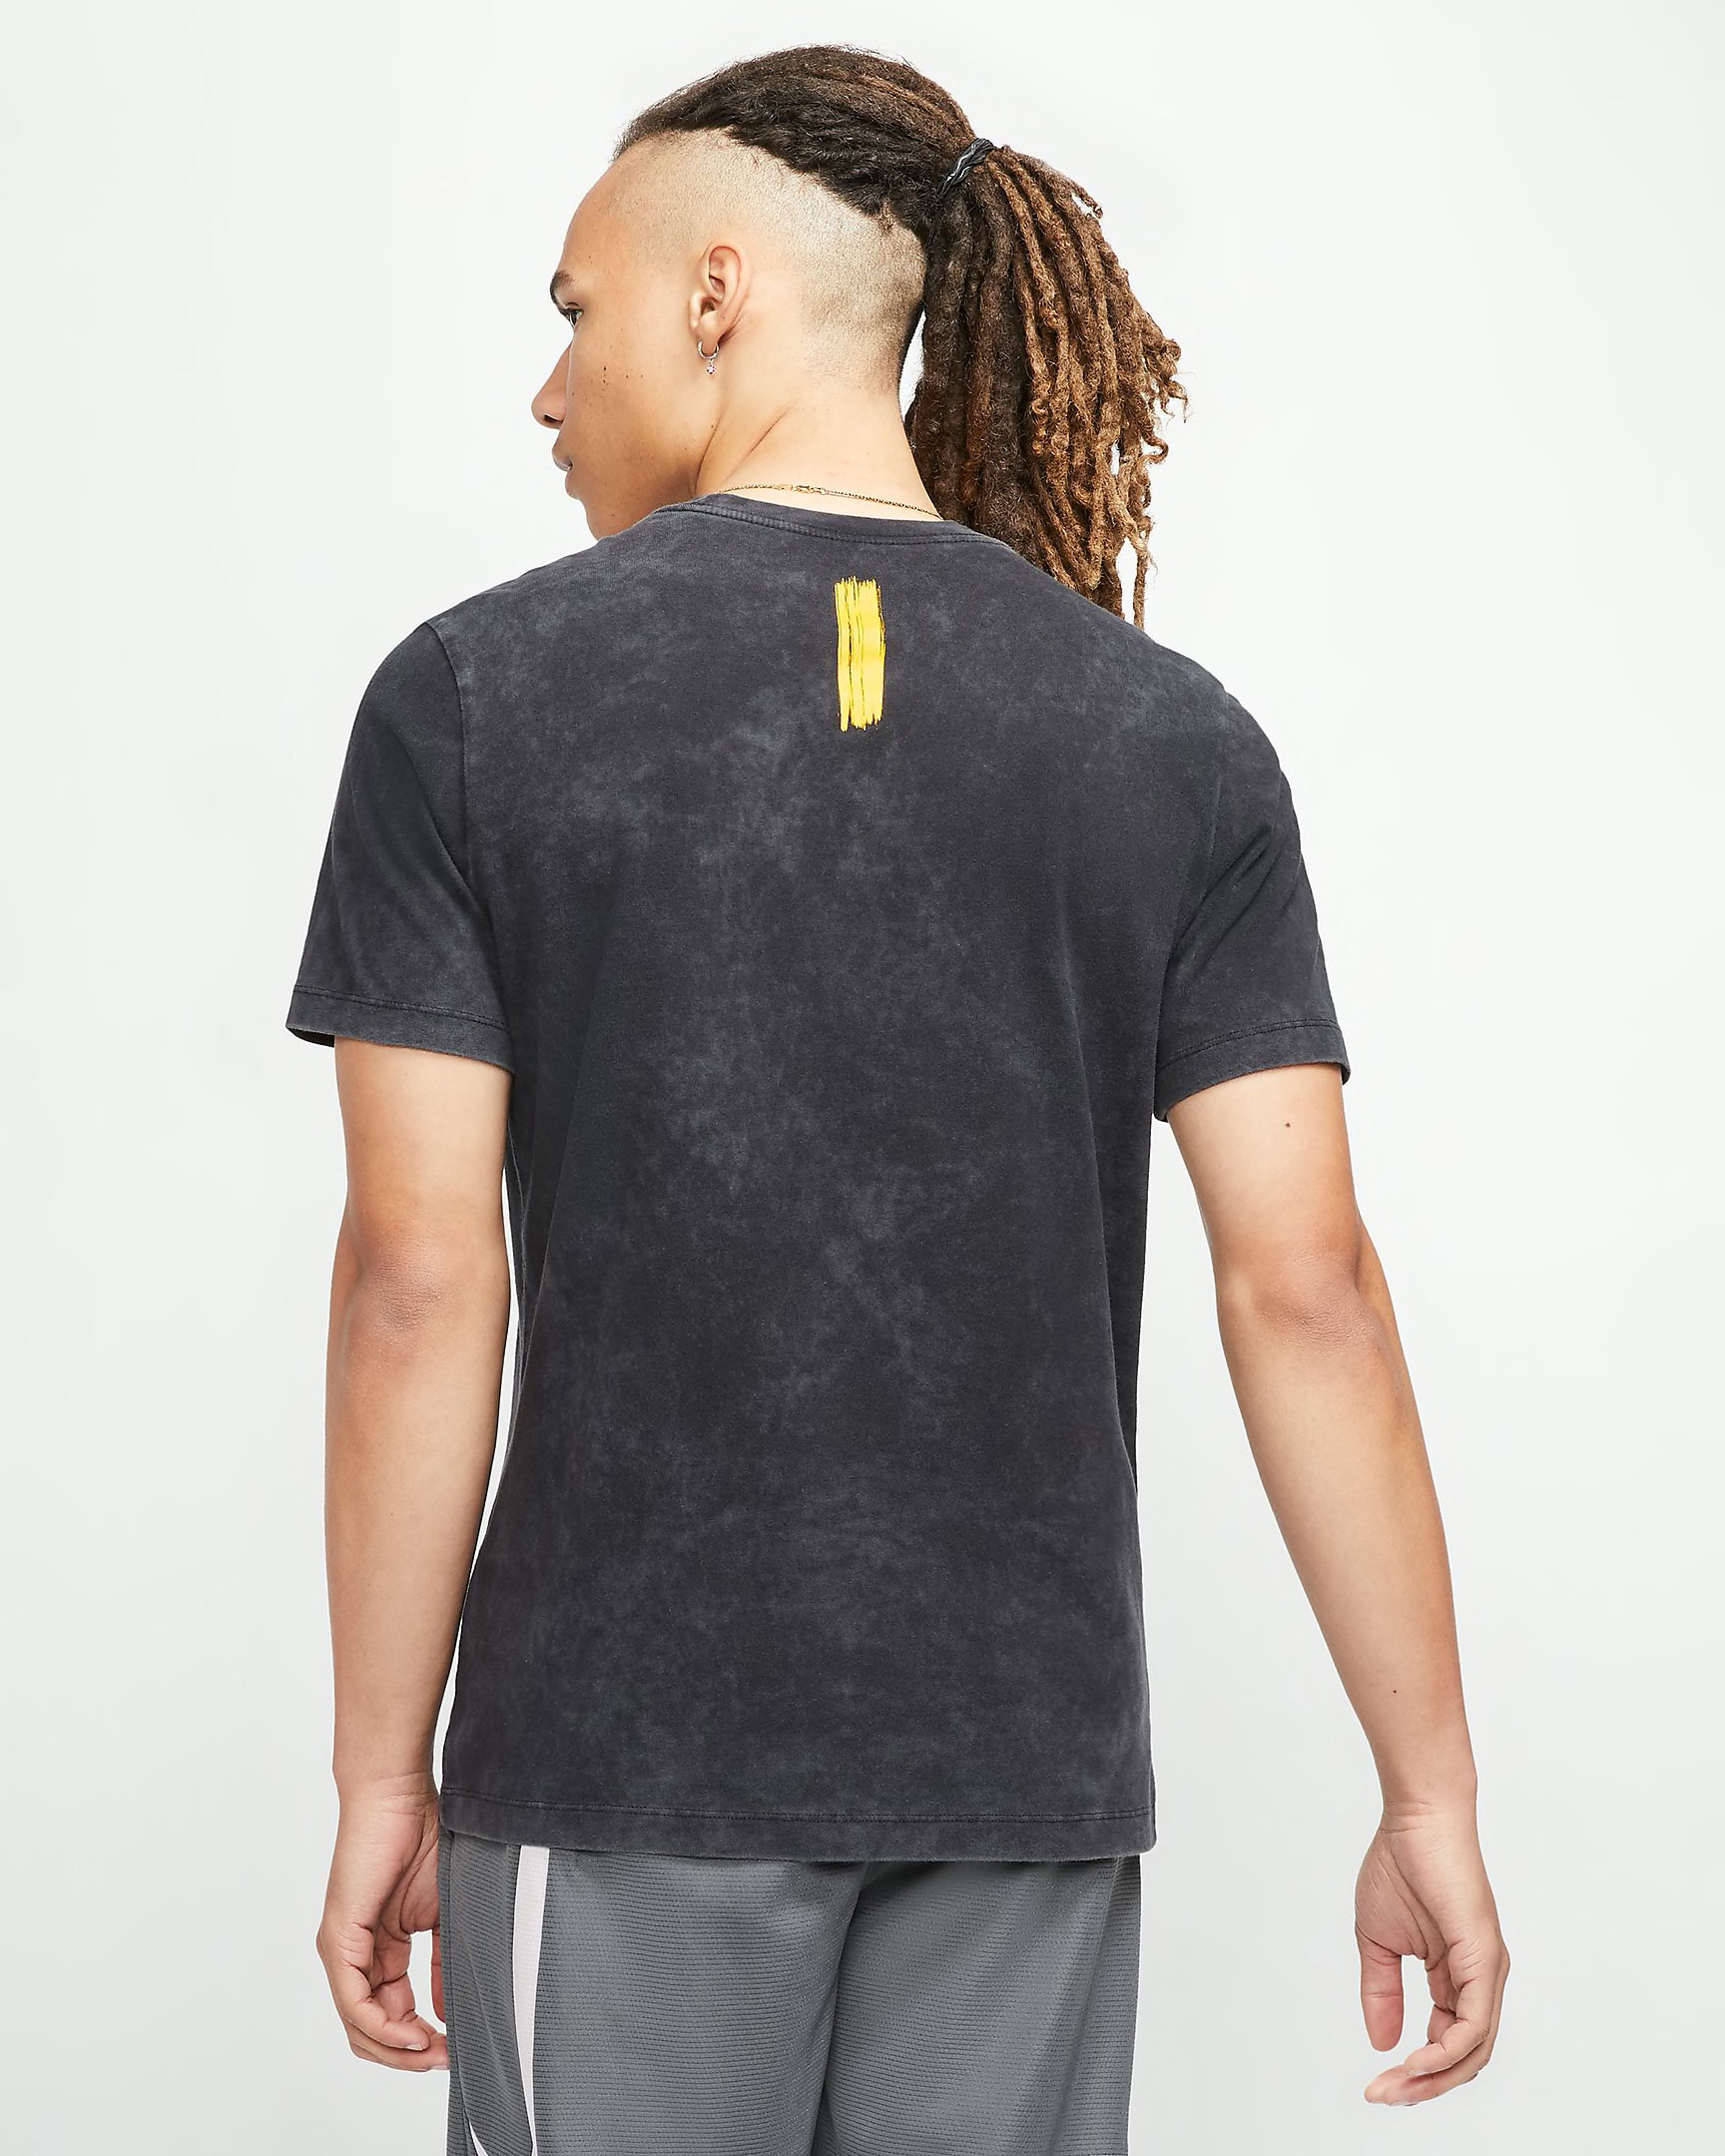 nike-kd-13-hype-shirt-2